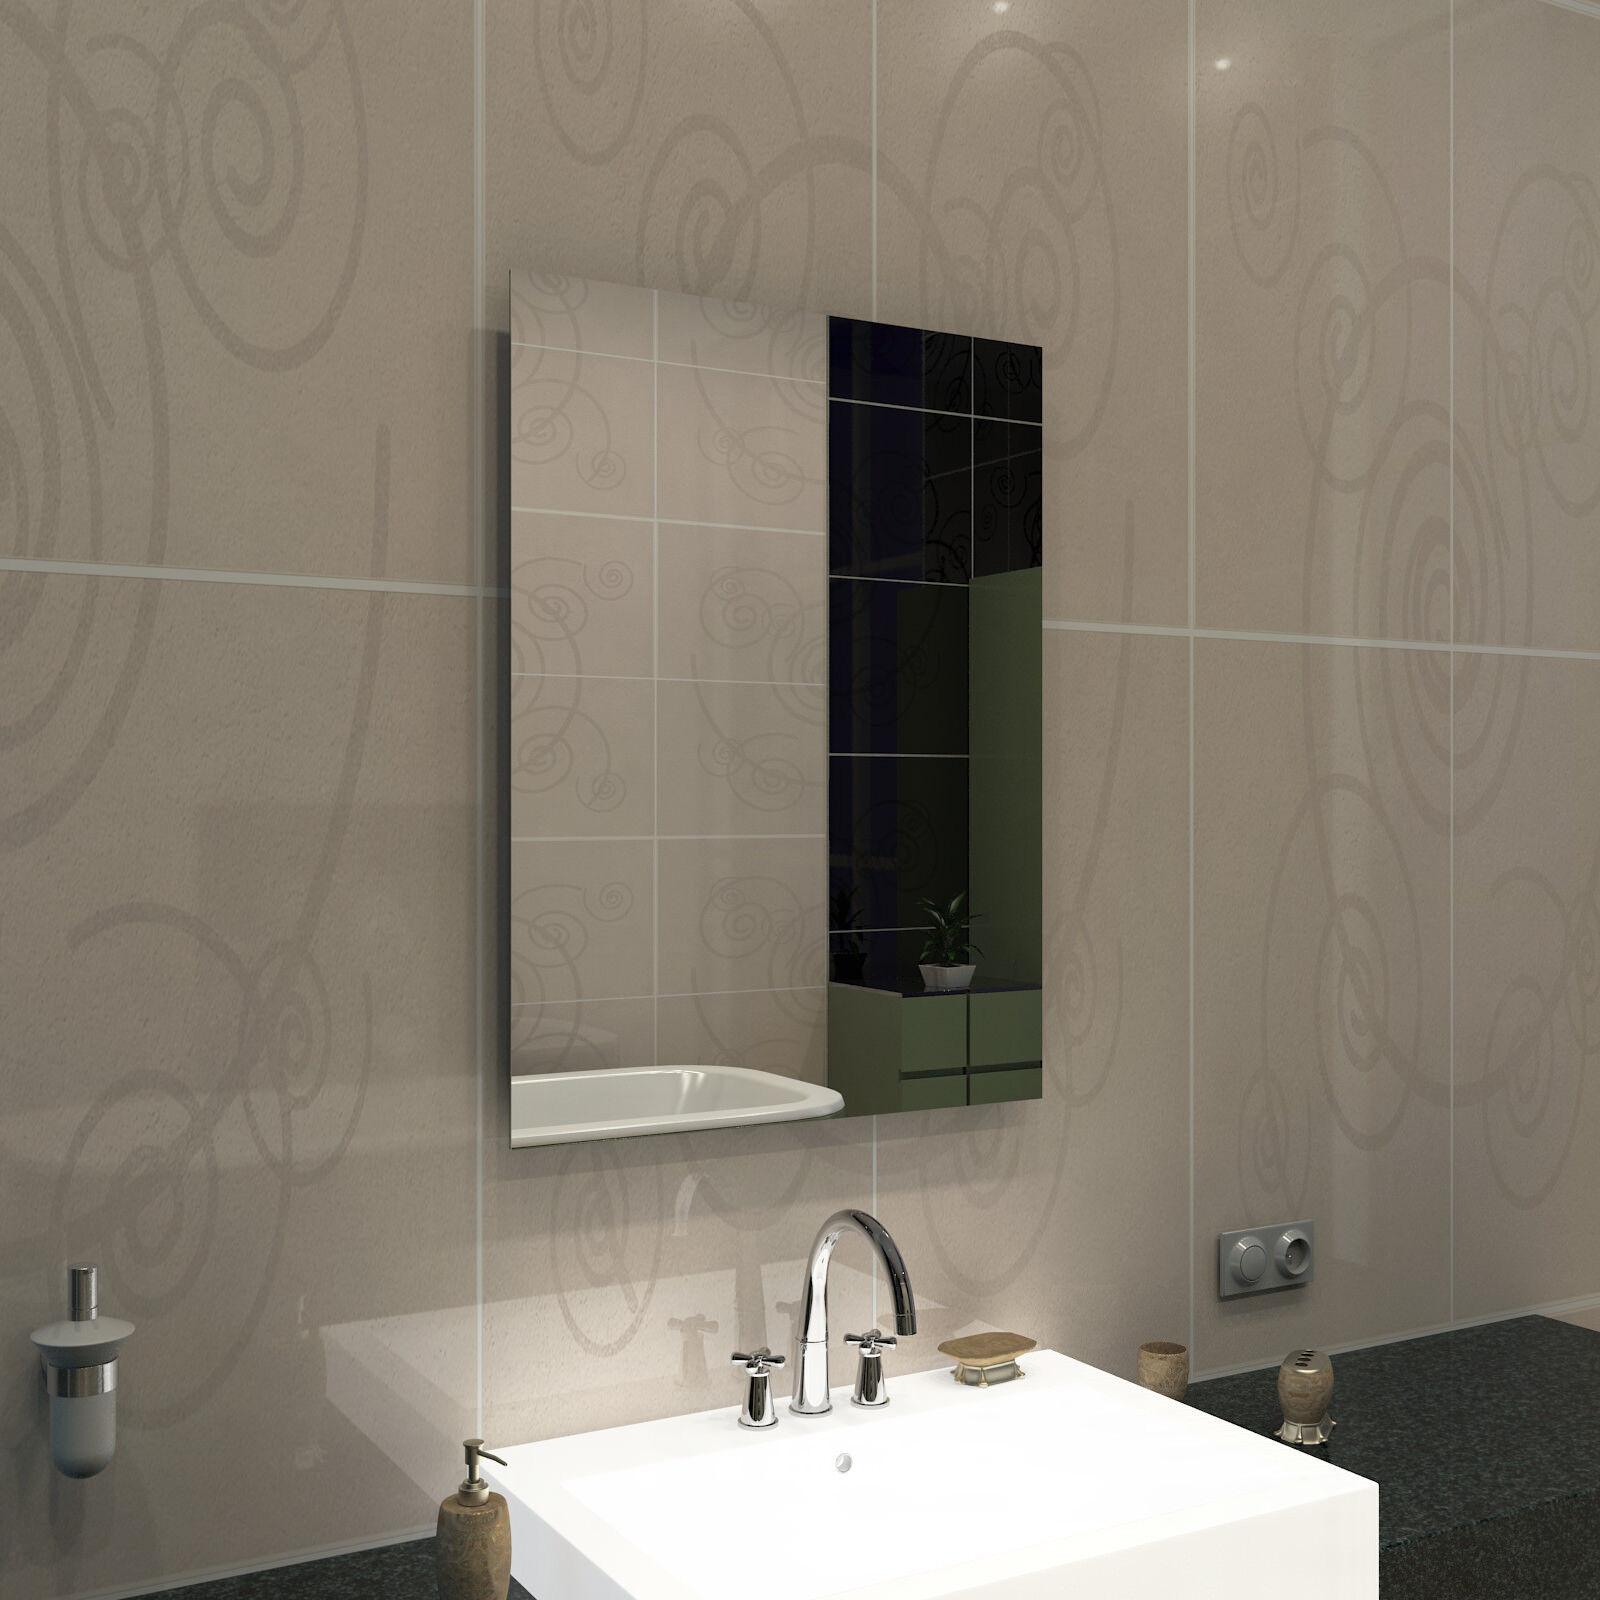 badspiegel ab 49 eur kristallspiegel wandspiegel ohne beleuchtung spiegel eur 49 00. Black Bedroom Furniture Sets. Home Design Ideas